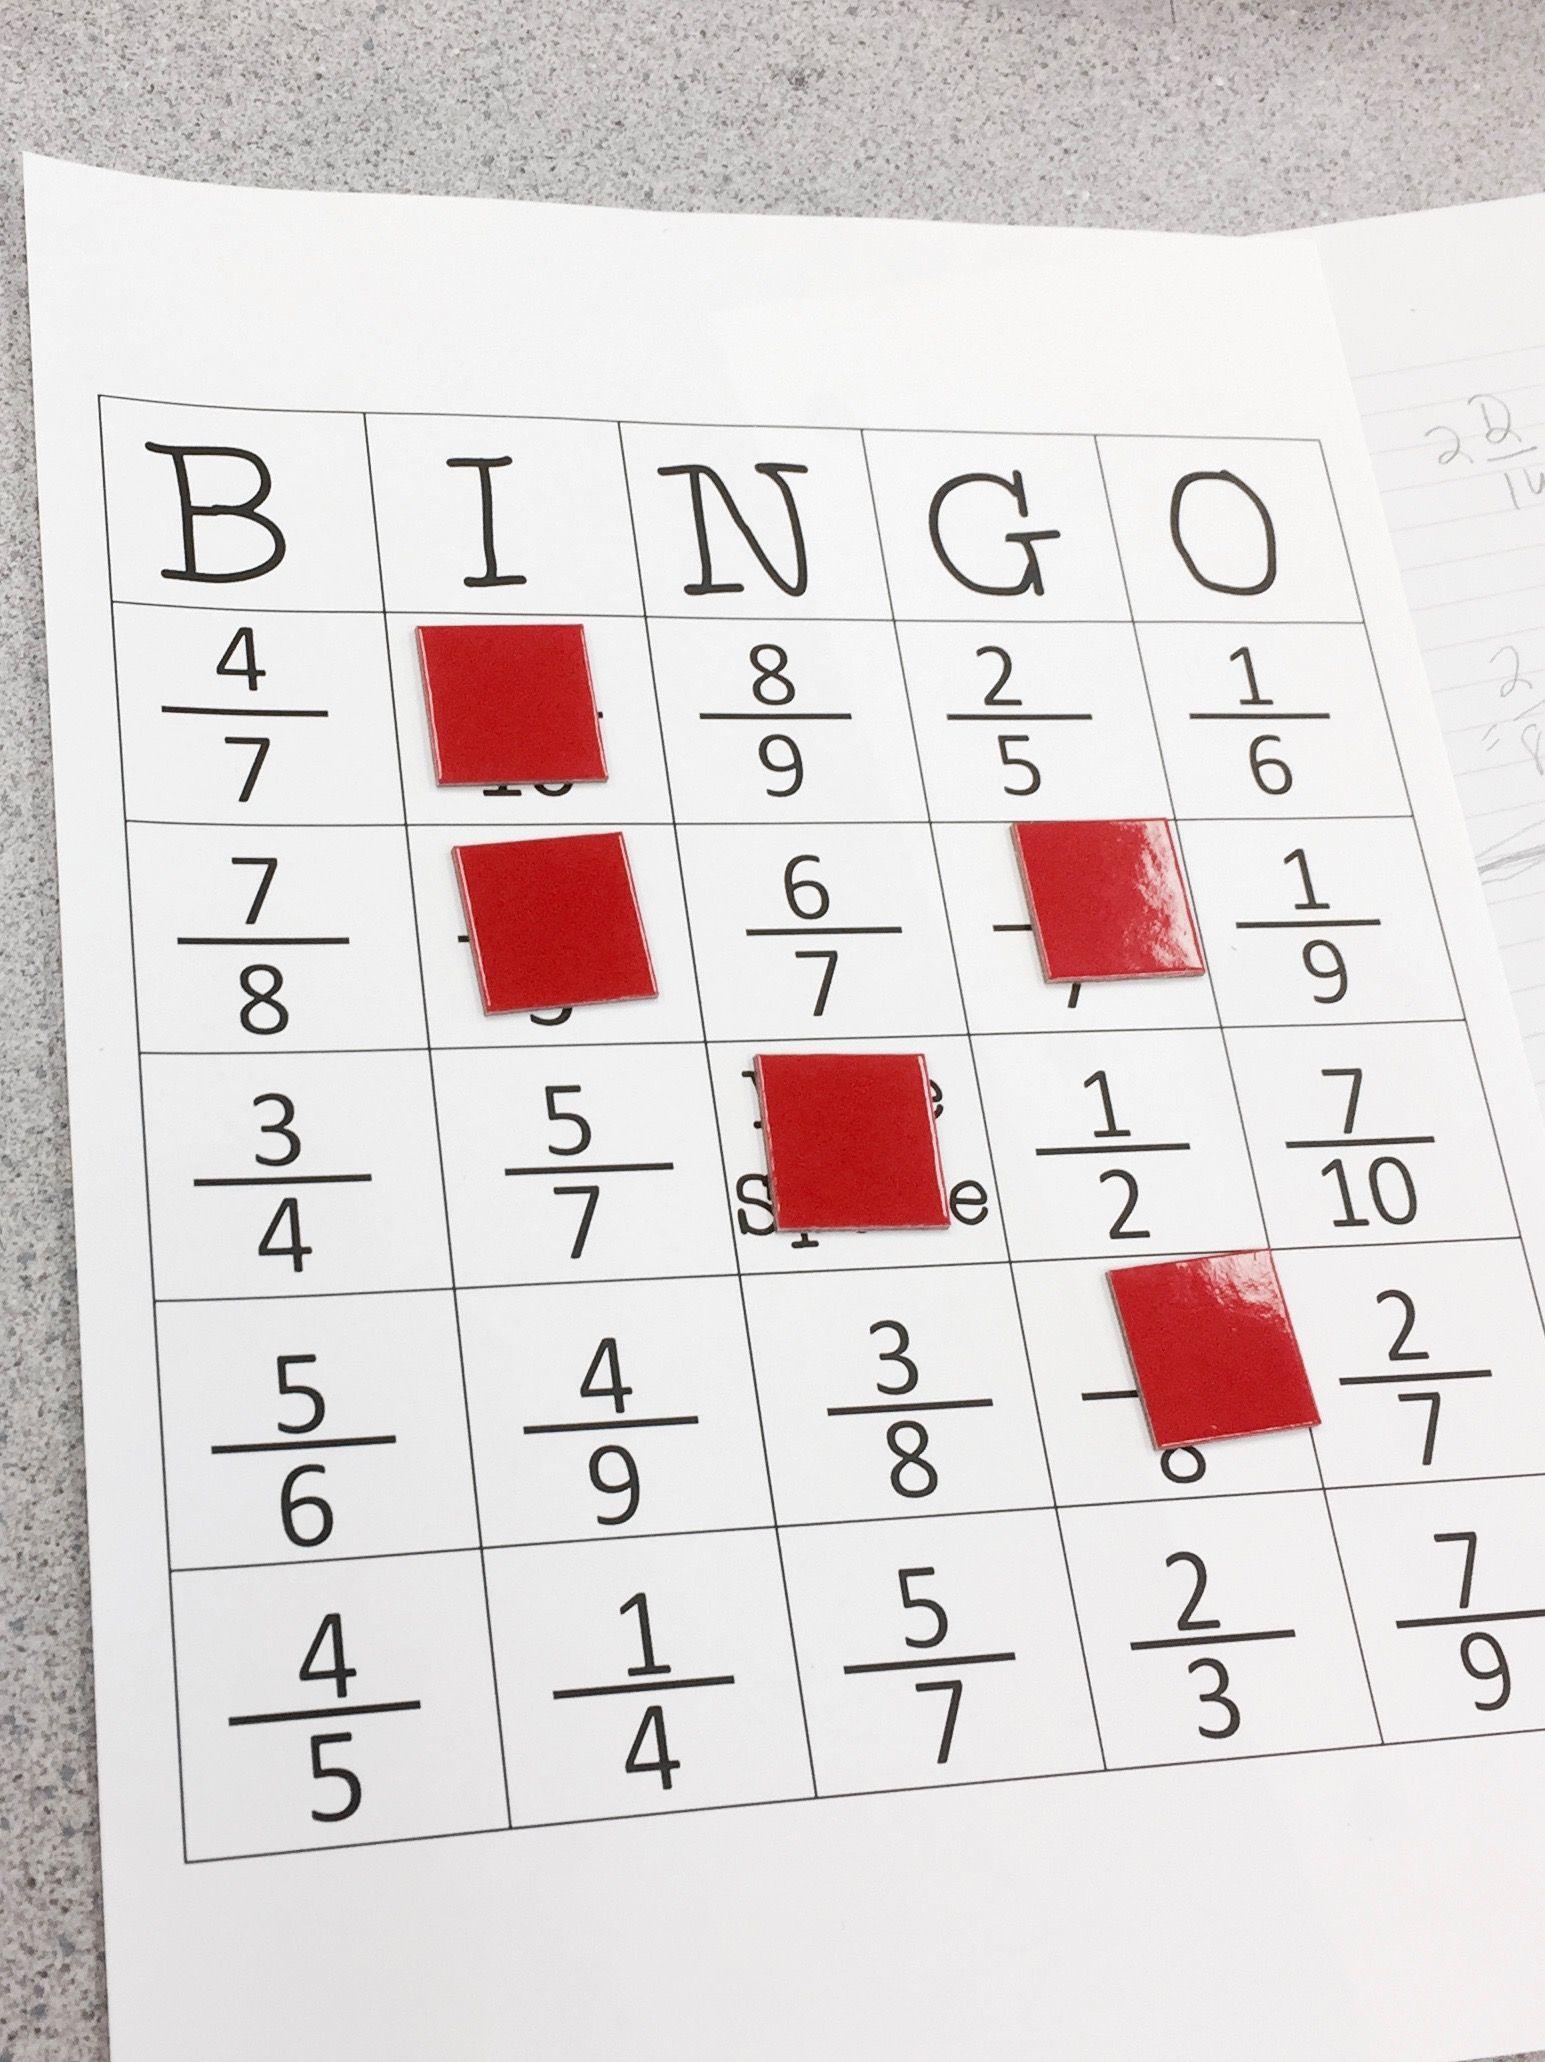 Equivalent Fraction Bingo | Fractions, Math, Equivalent